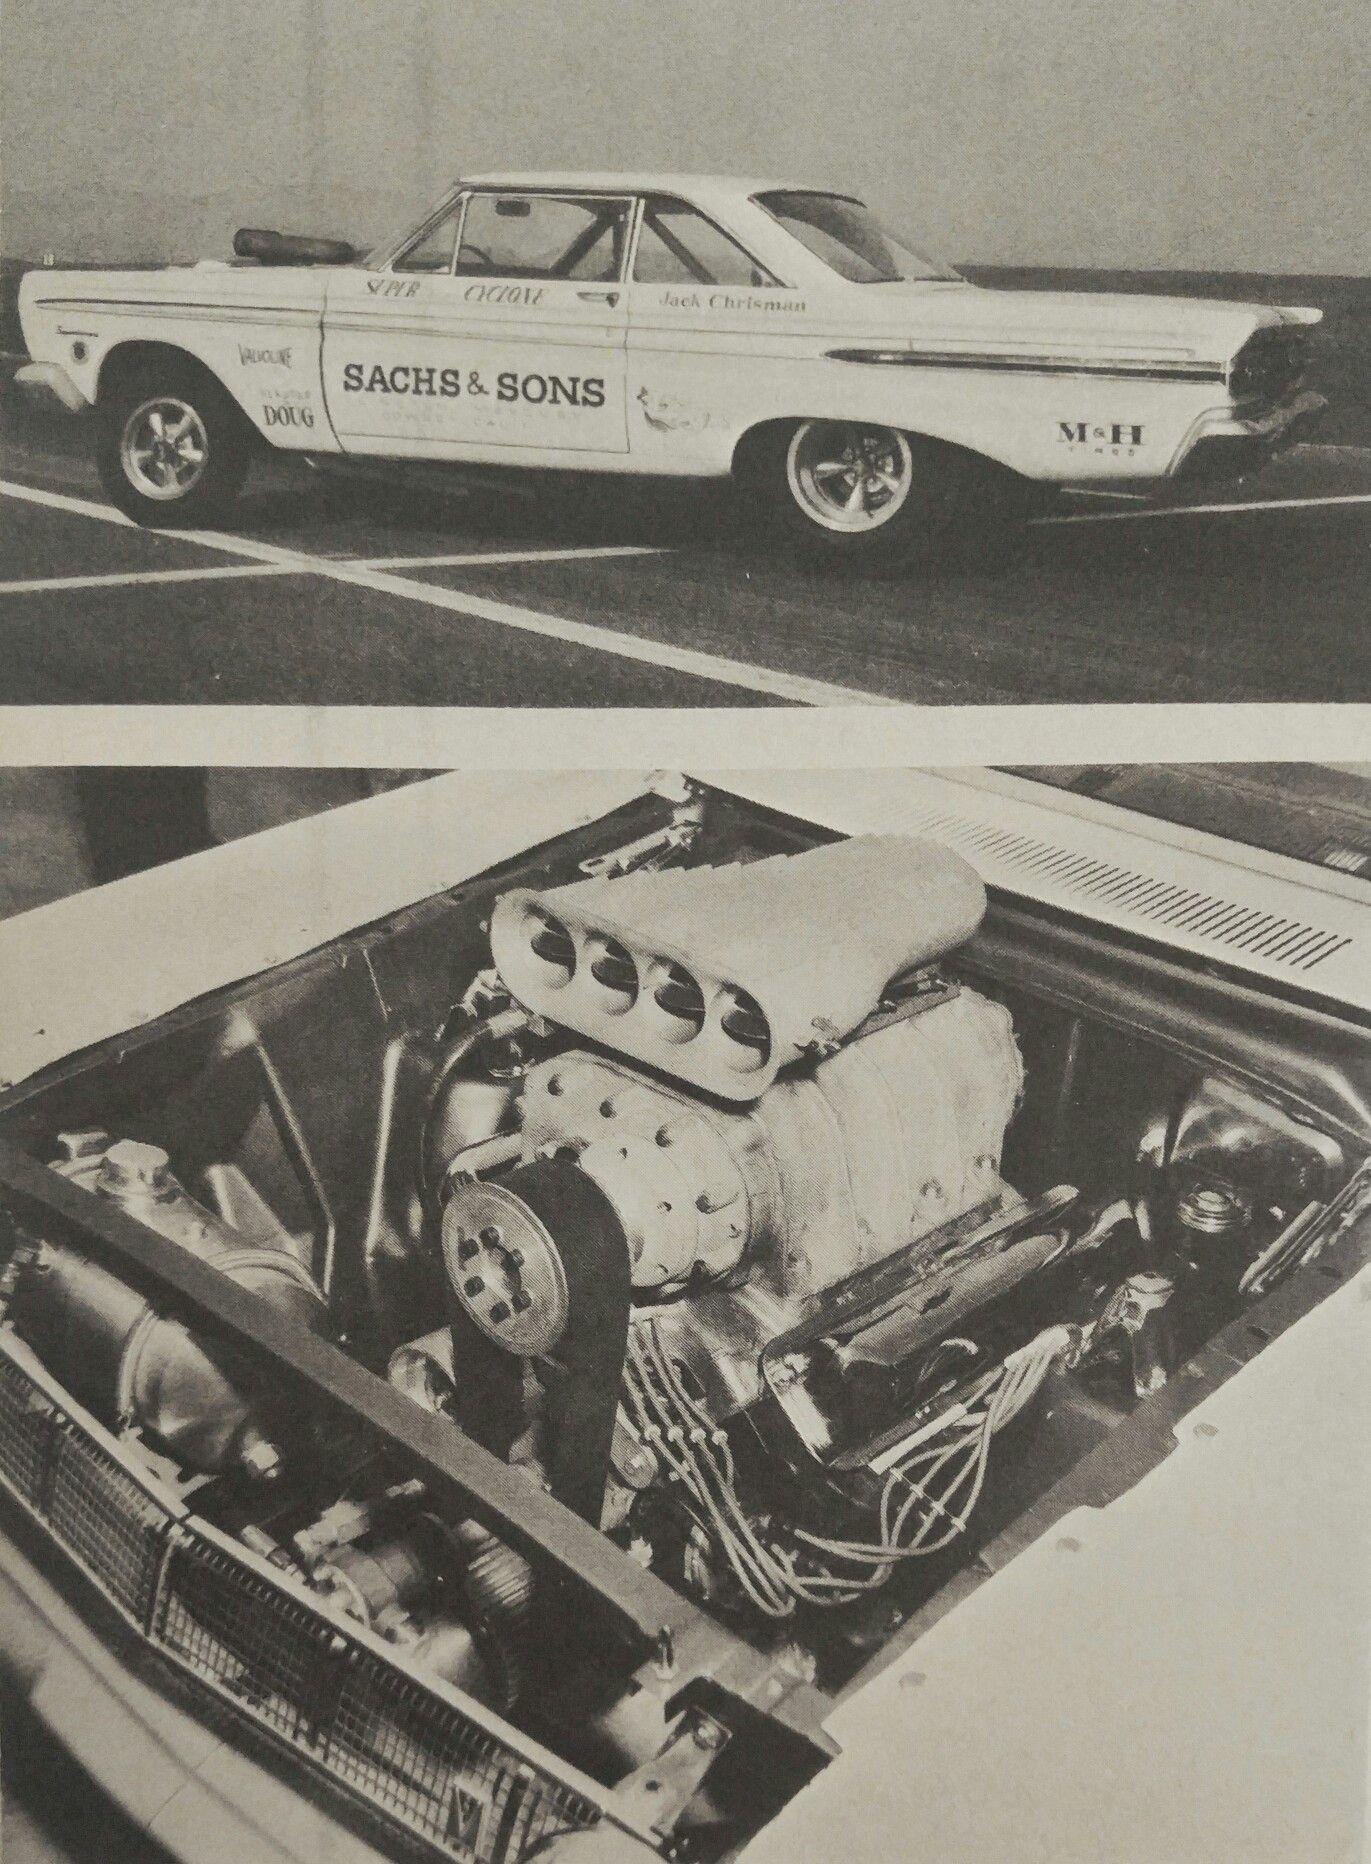 Jack Christman's 1964 Comet  | Drag Cars | Old race cars, Drag cars